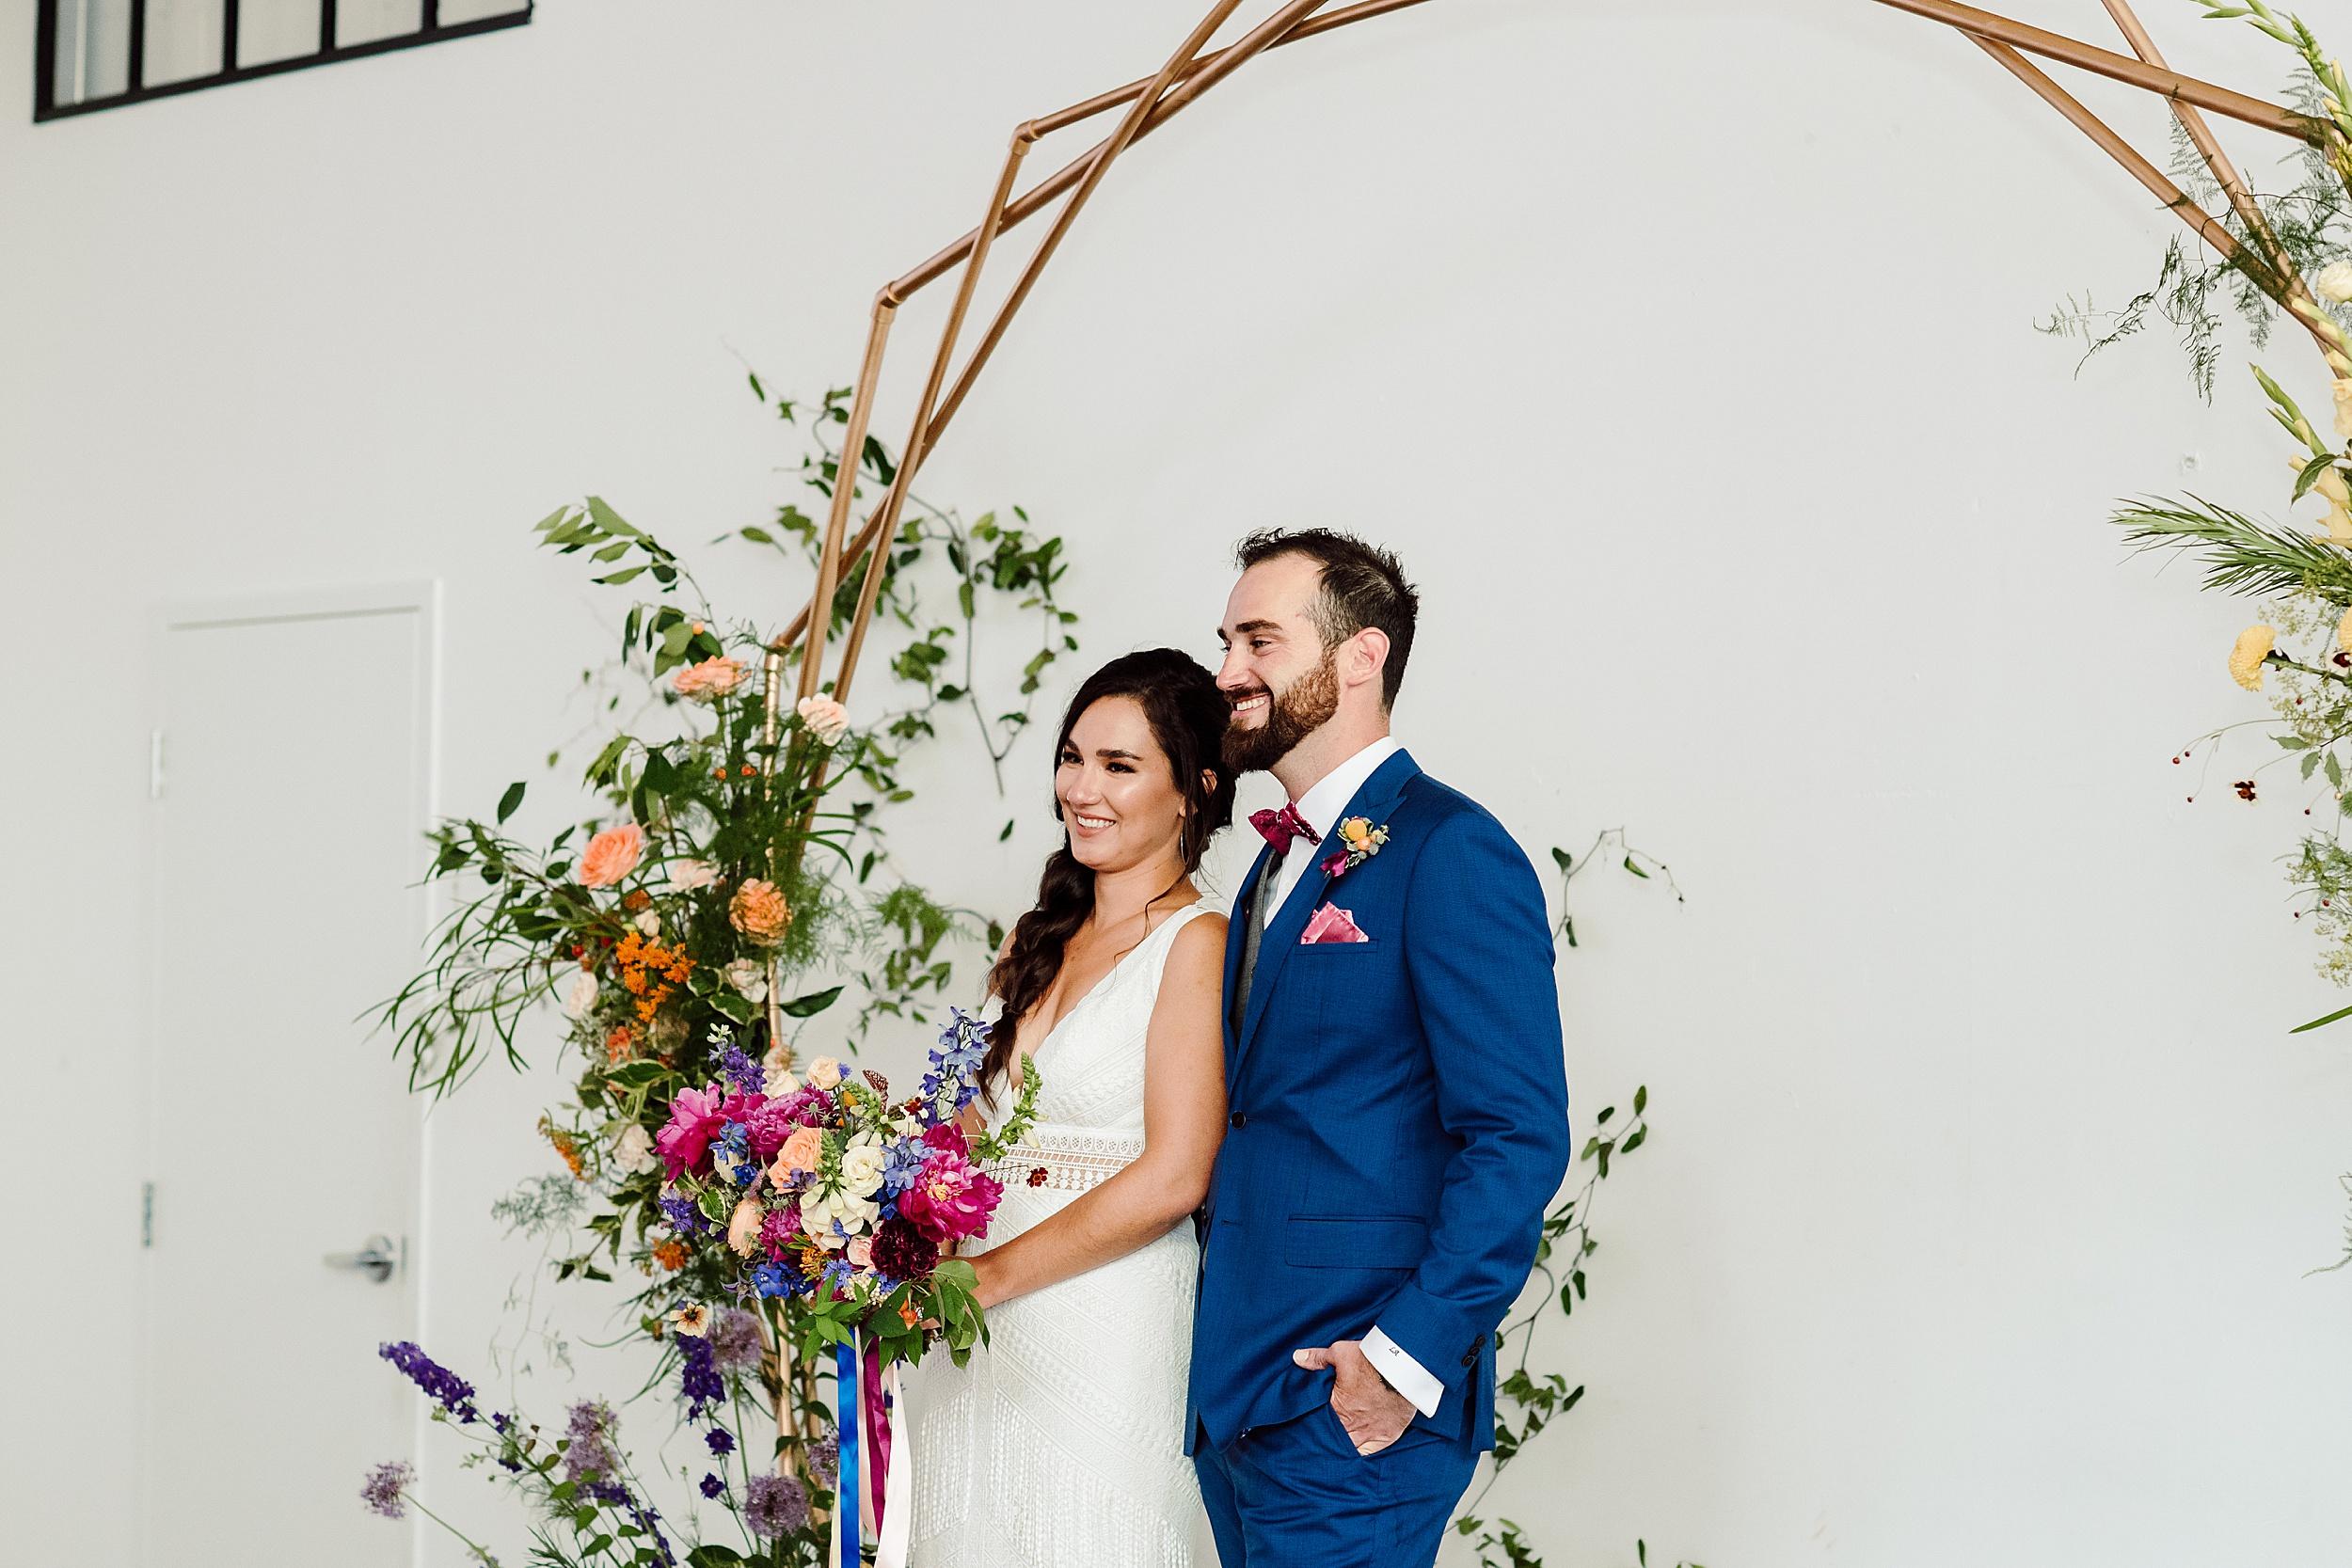 Airship-37-Berkeley-Events-Distillery-District-Wedding-Toronto-Wedding-Photographers_0064.jpg